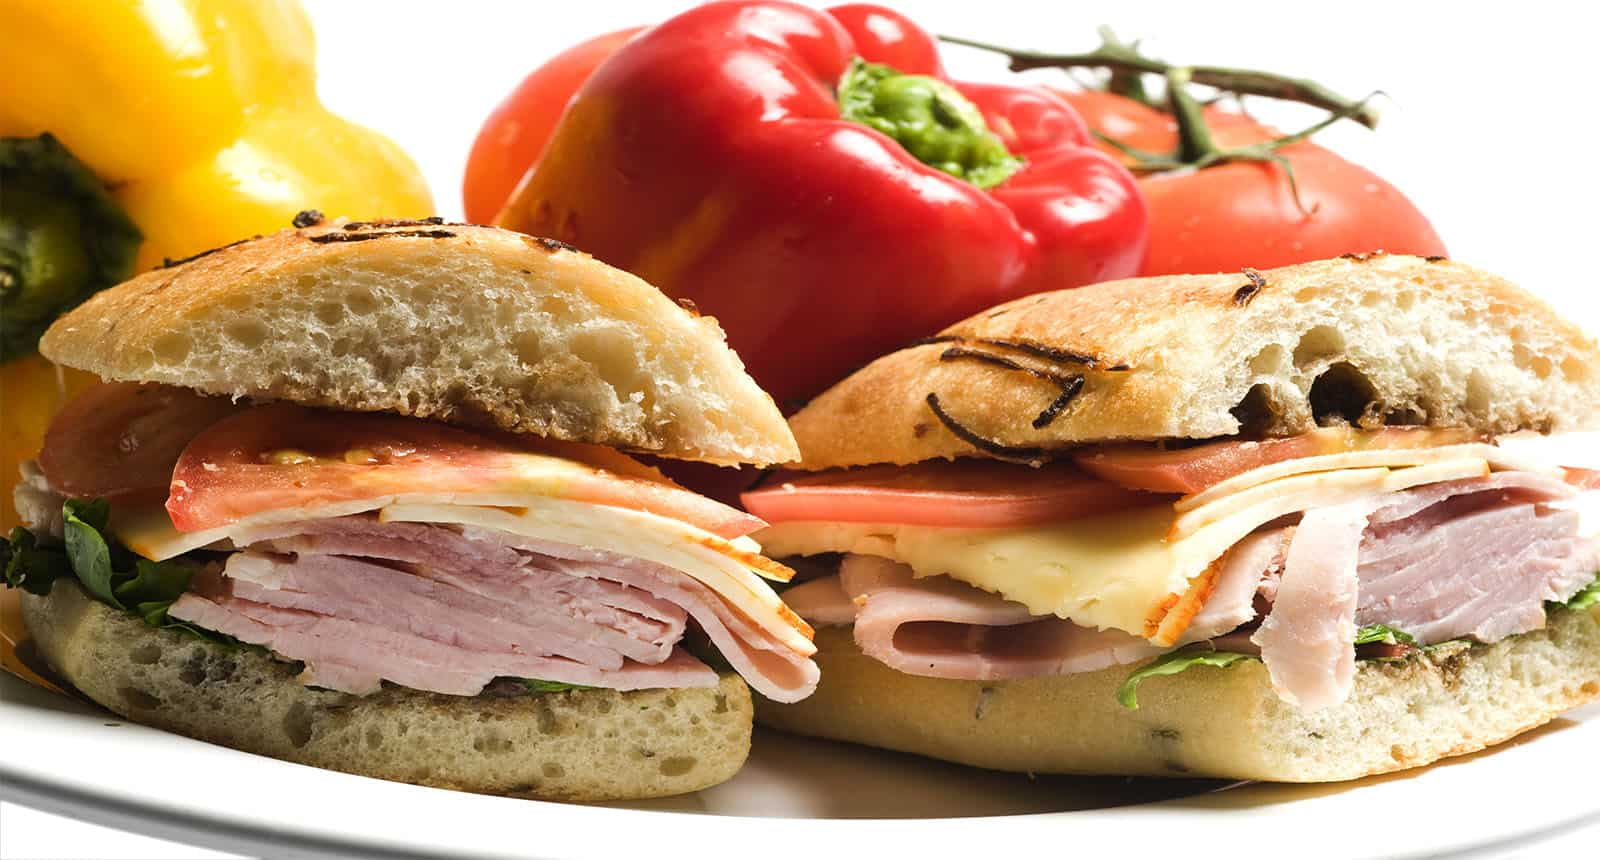 Sandwich Muenster Cheese